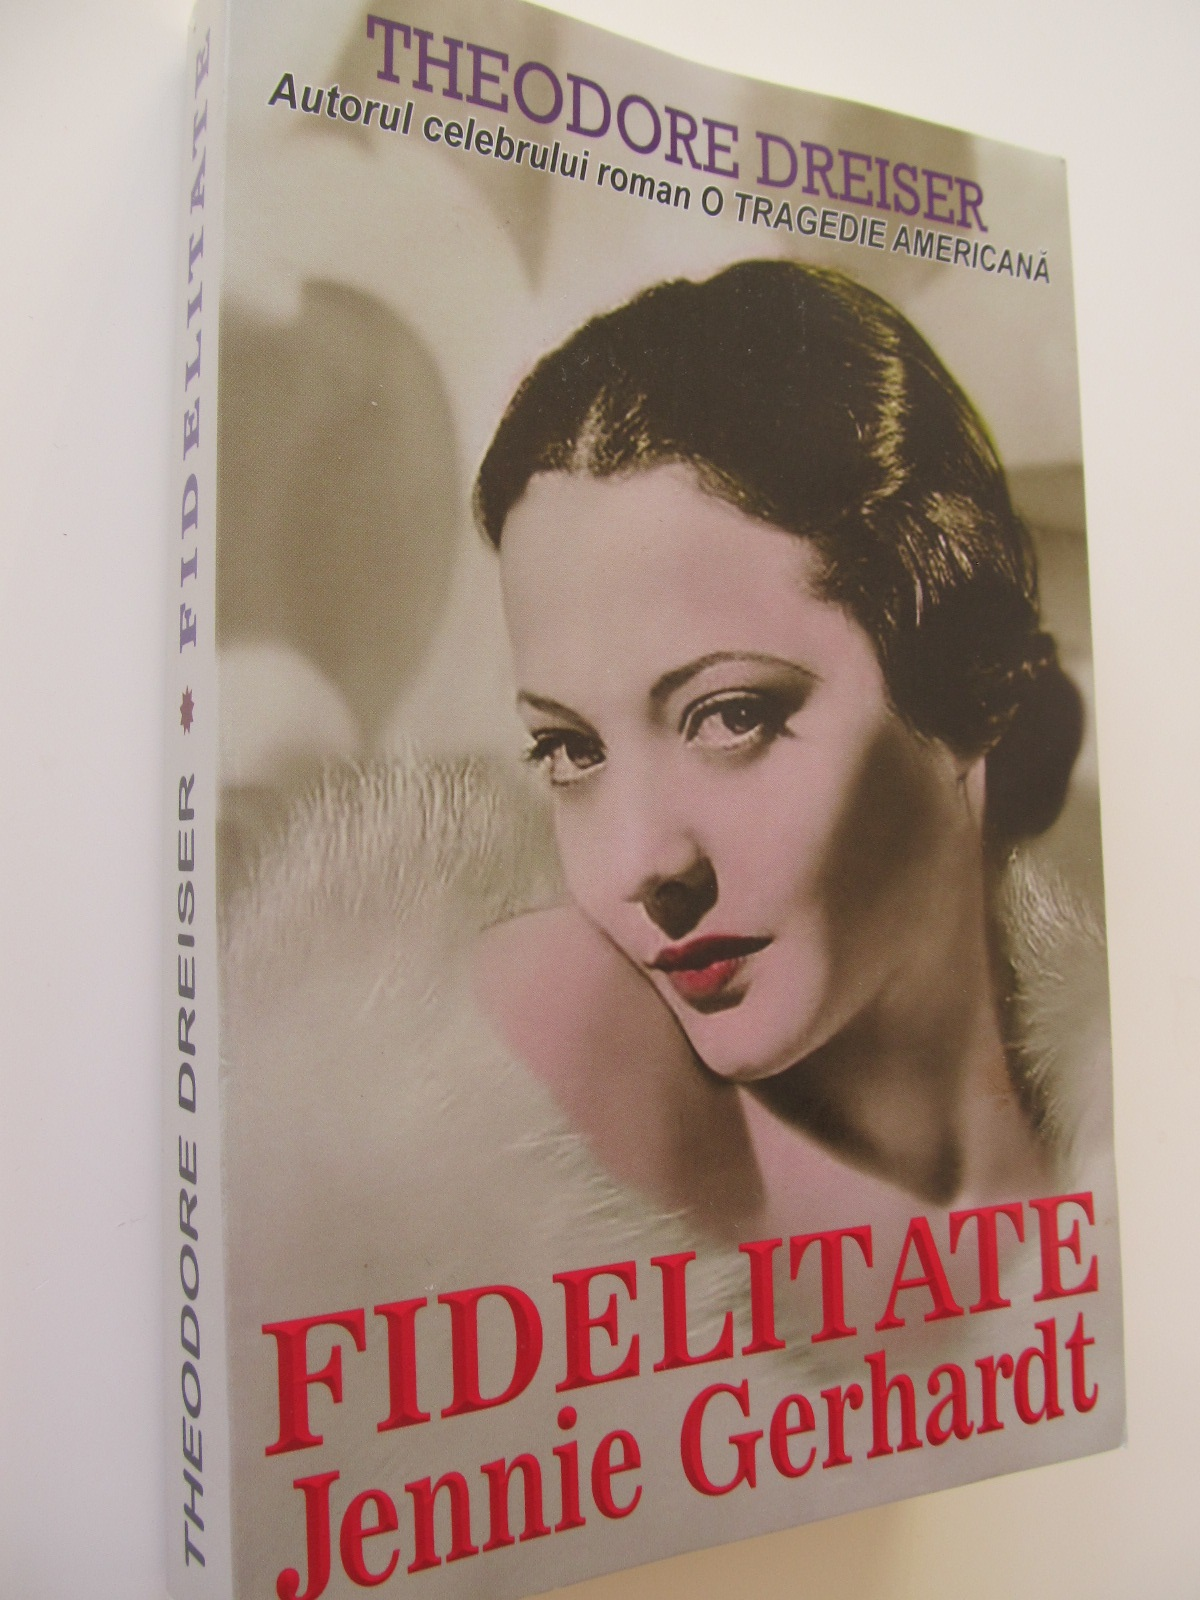 Fidelitate. Jennie Gerhardt - Theodore Dreiser | Detalii carte